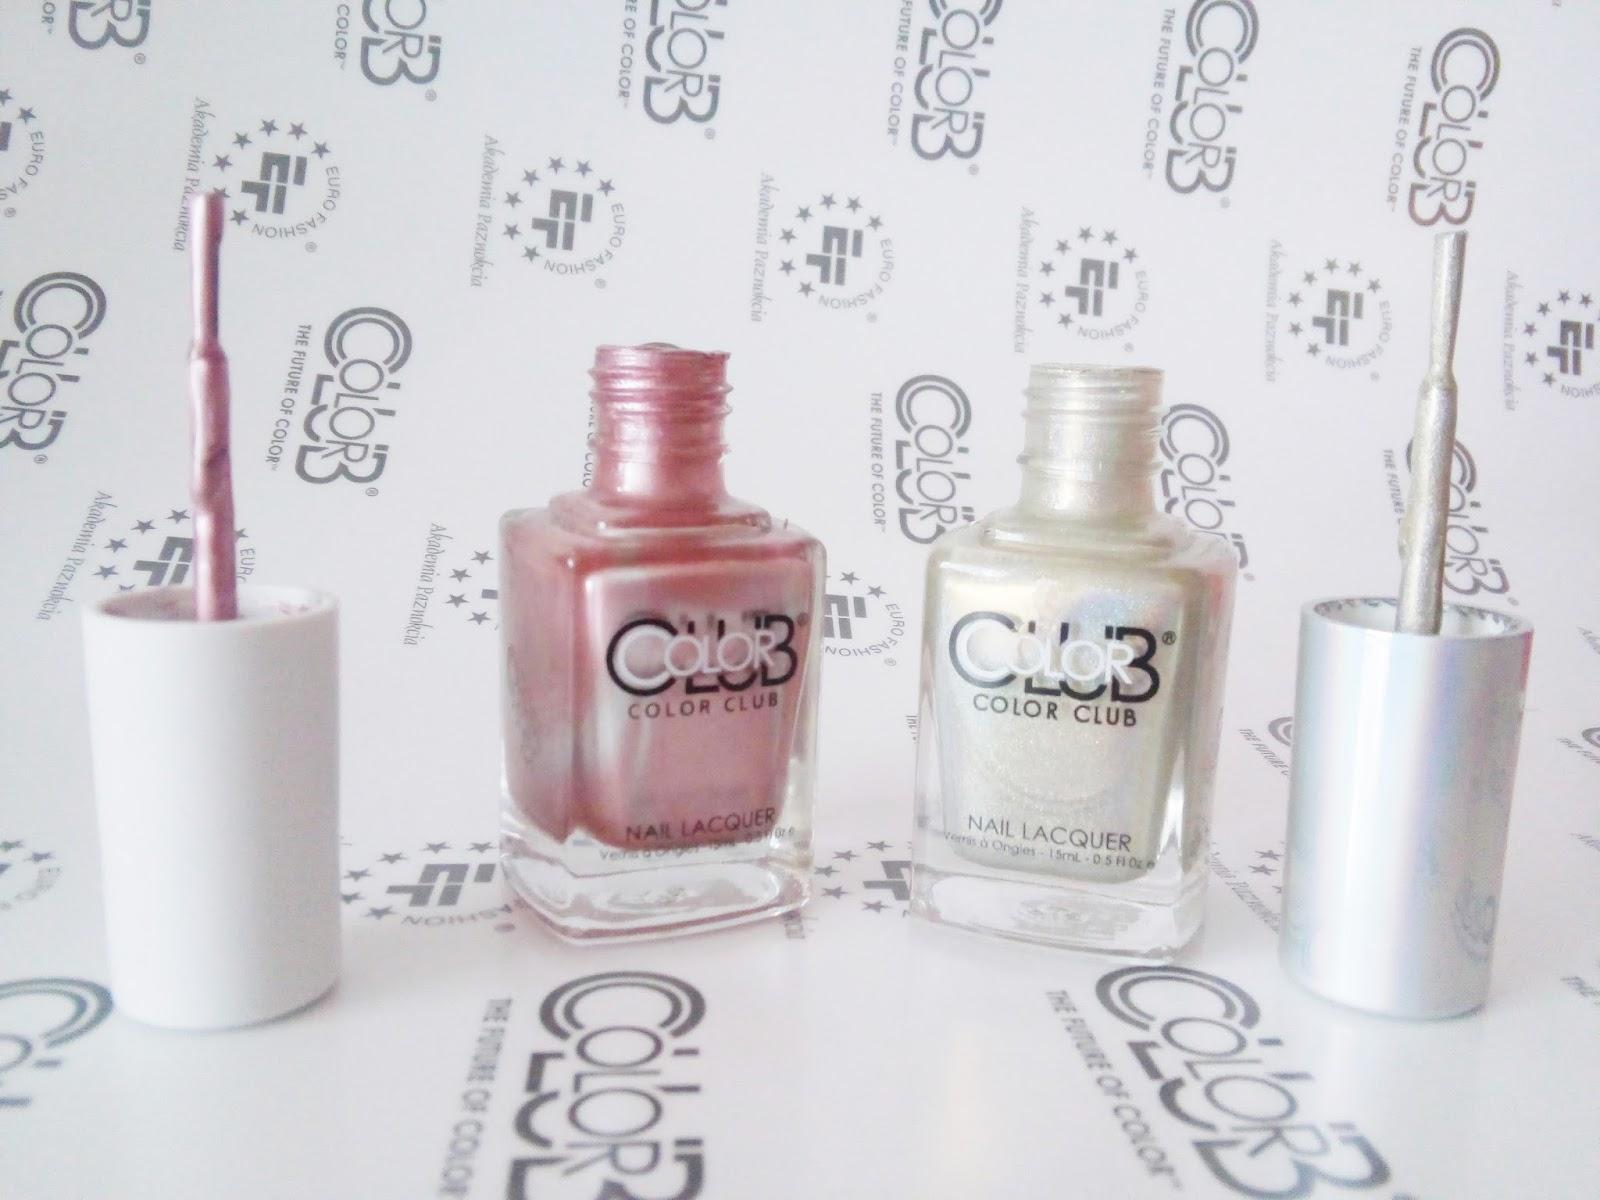 lakier color club  1091, 1088 nail lacquer